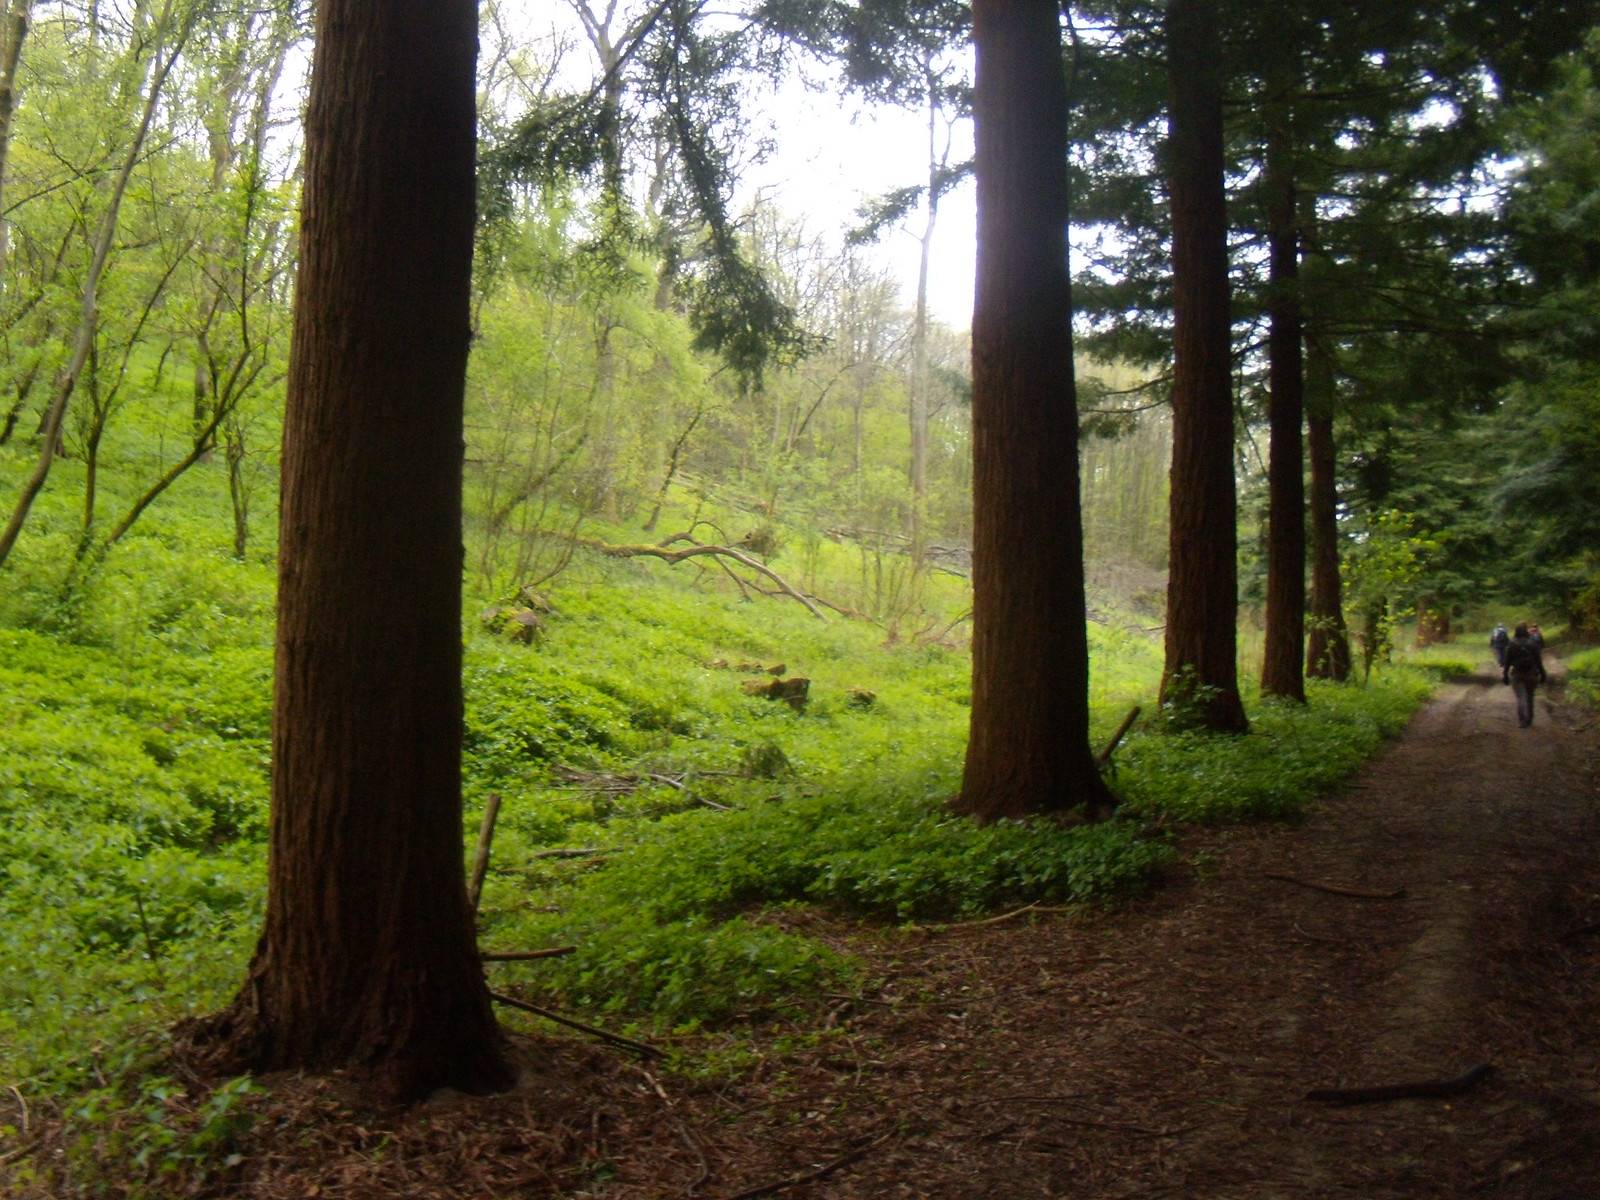 Redwood grove Meresworth Woods. Yalding to Borough Green